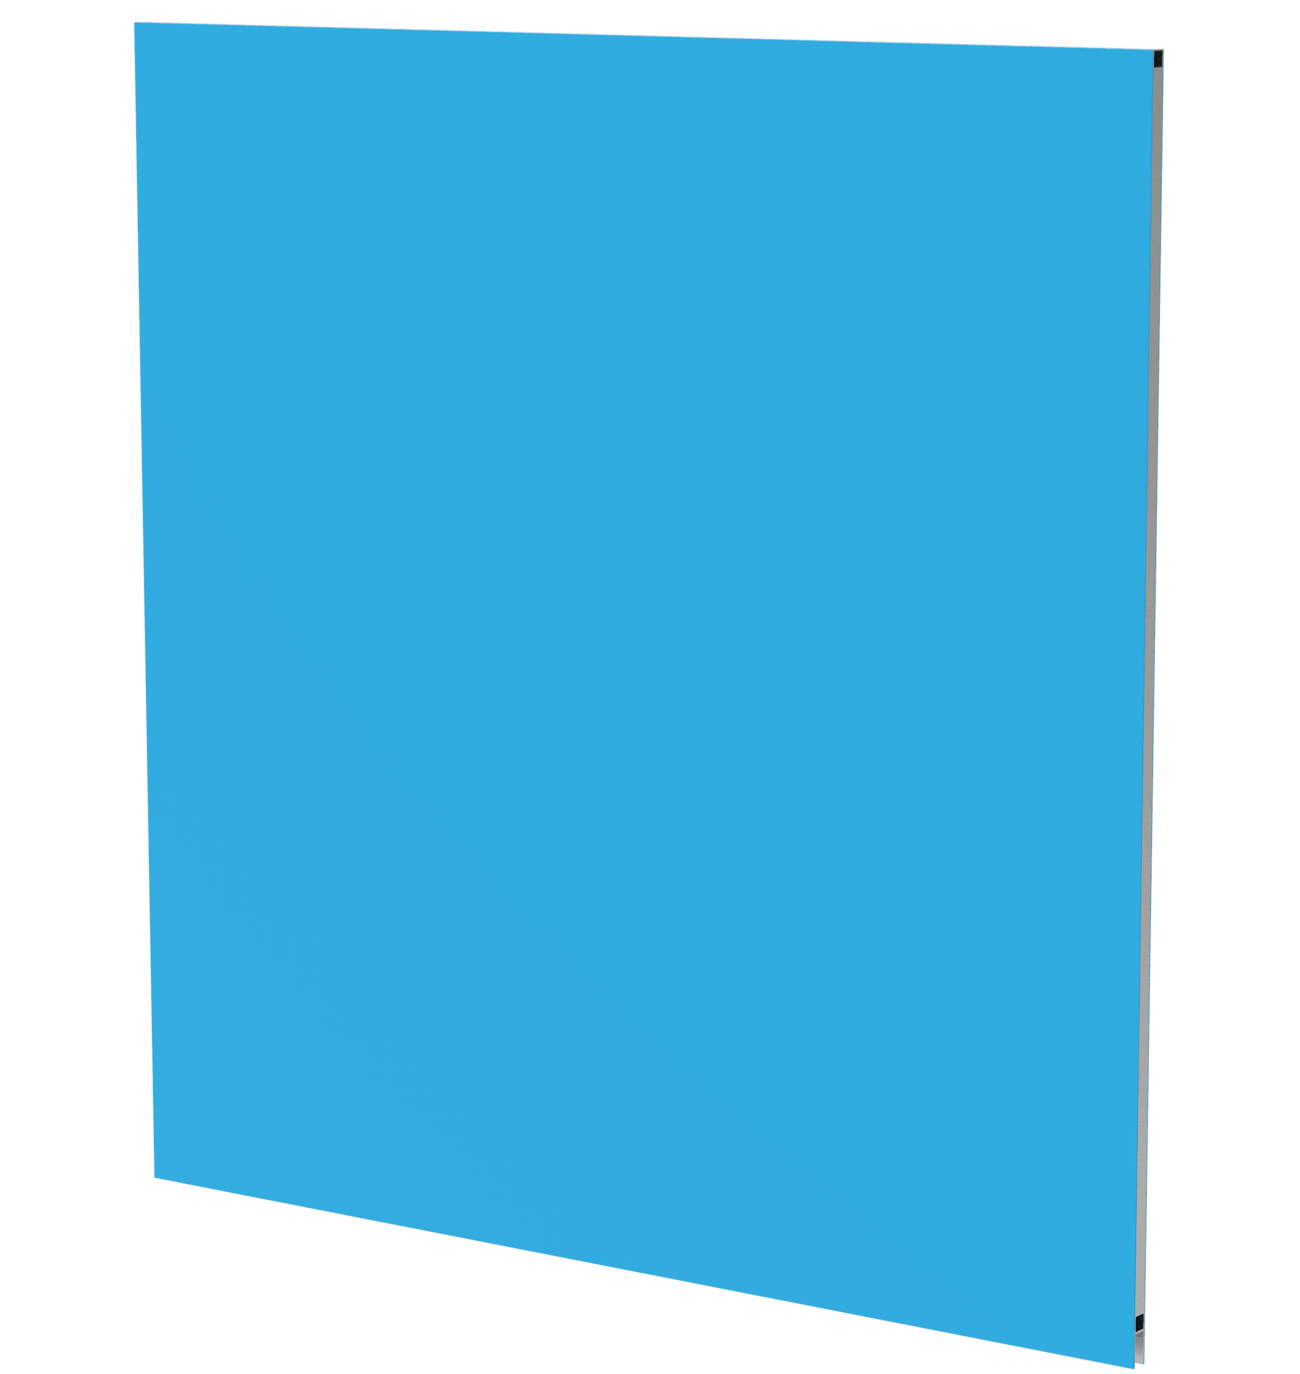 Full Isolation PVC with Galvanized frame